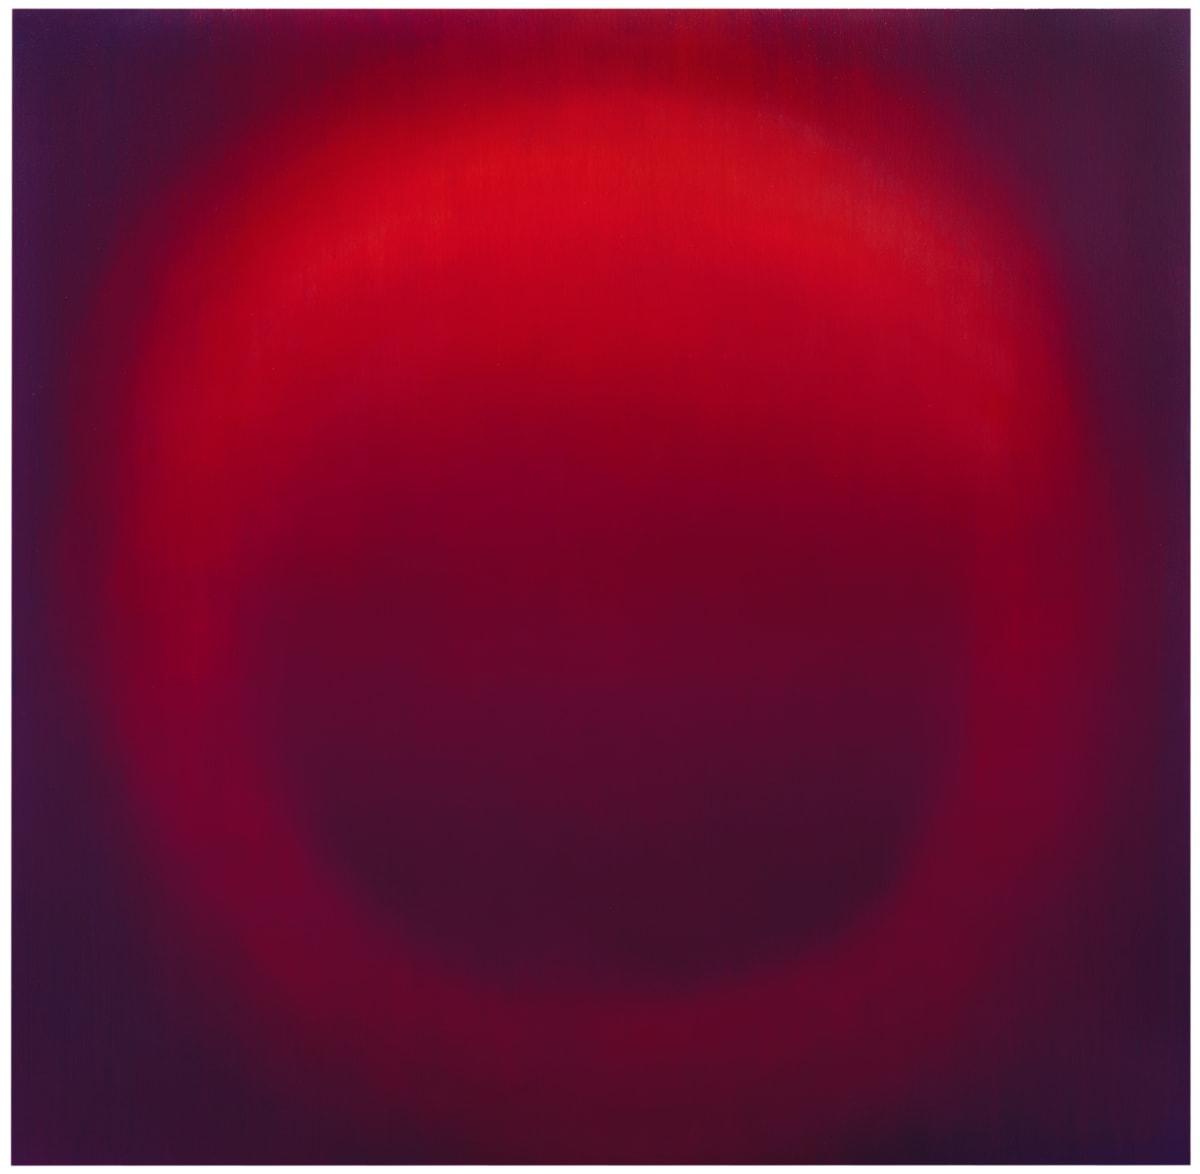 Sergio Lucena, Pintura No. 19, 2011